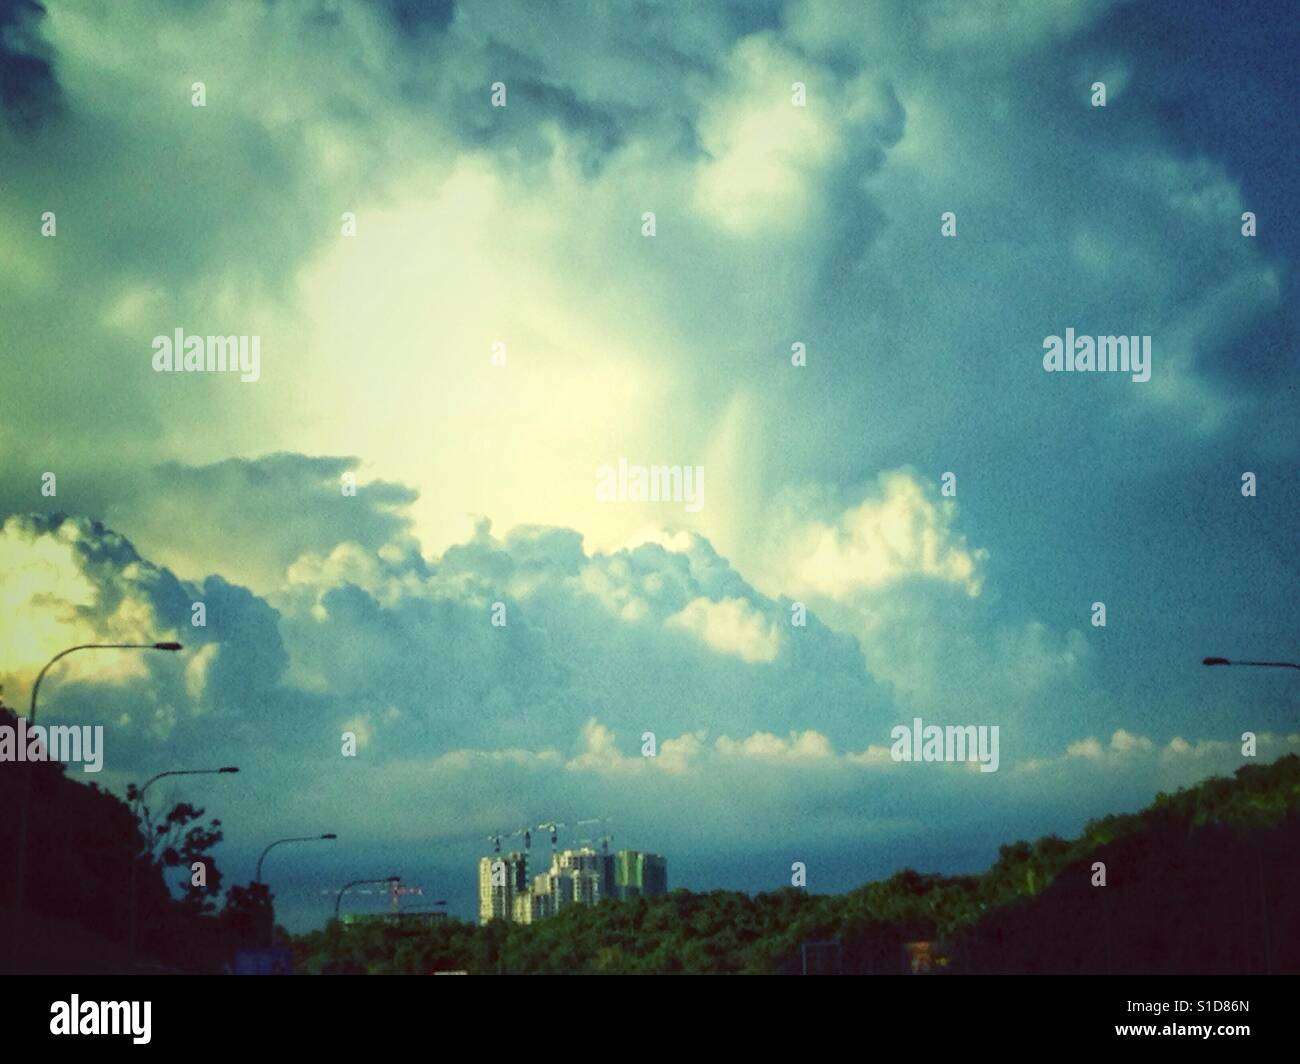 Large Cumulonimbus clouds over building on hill top - Stock Image